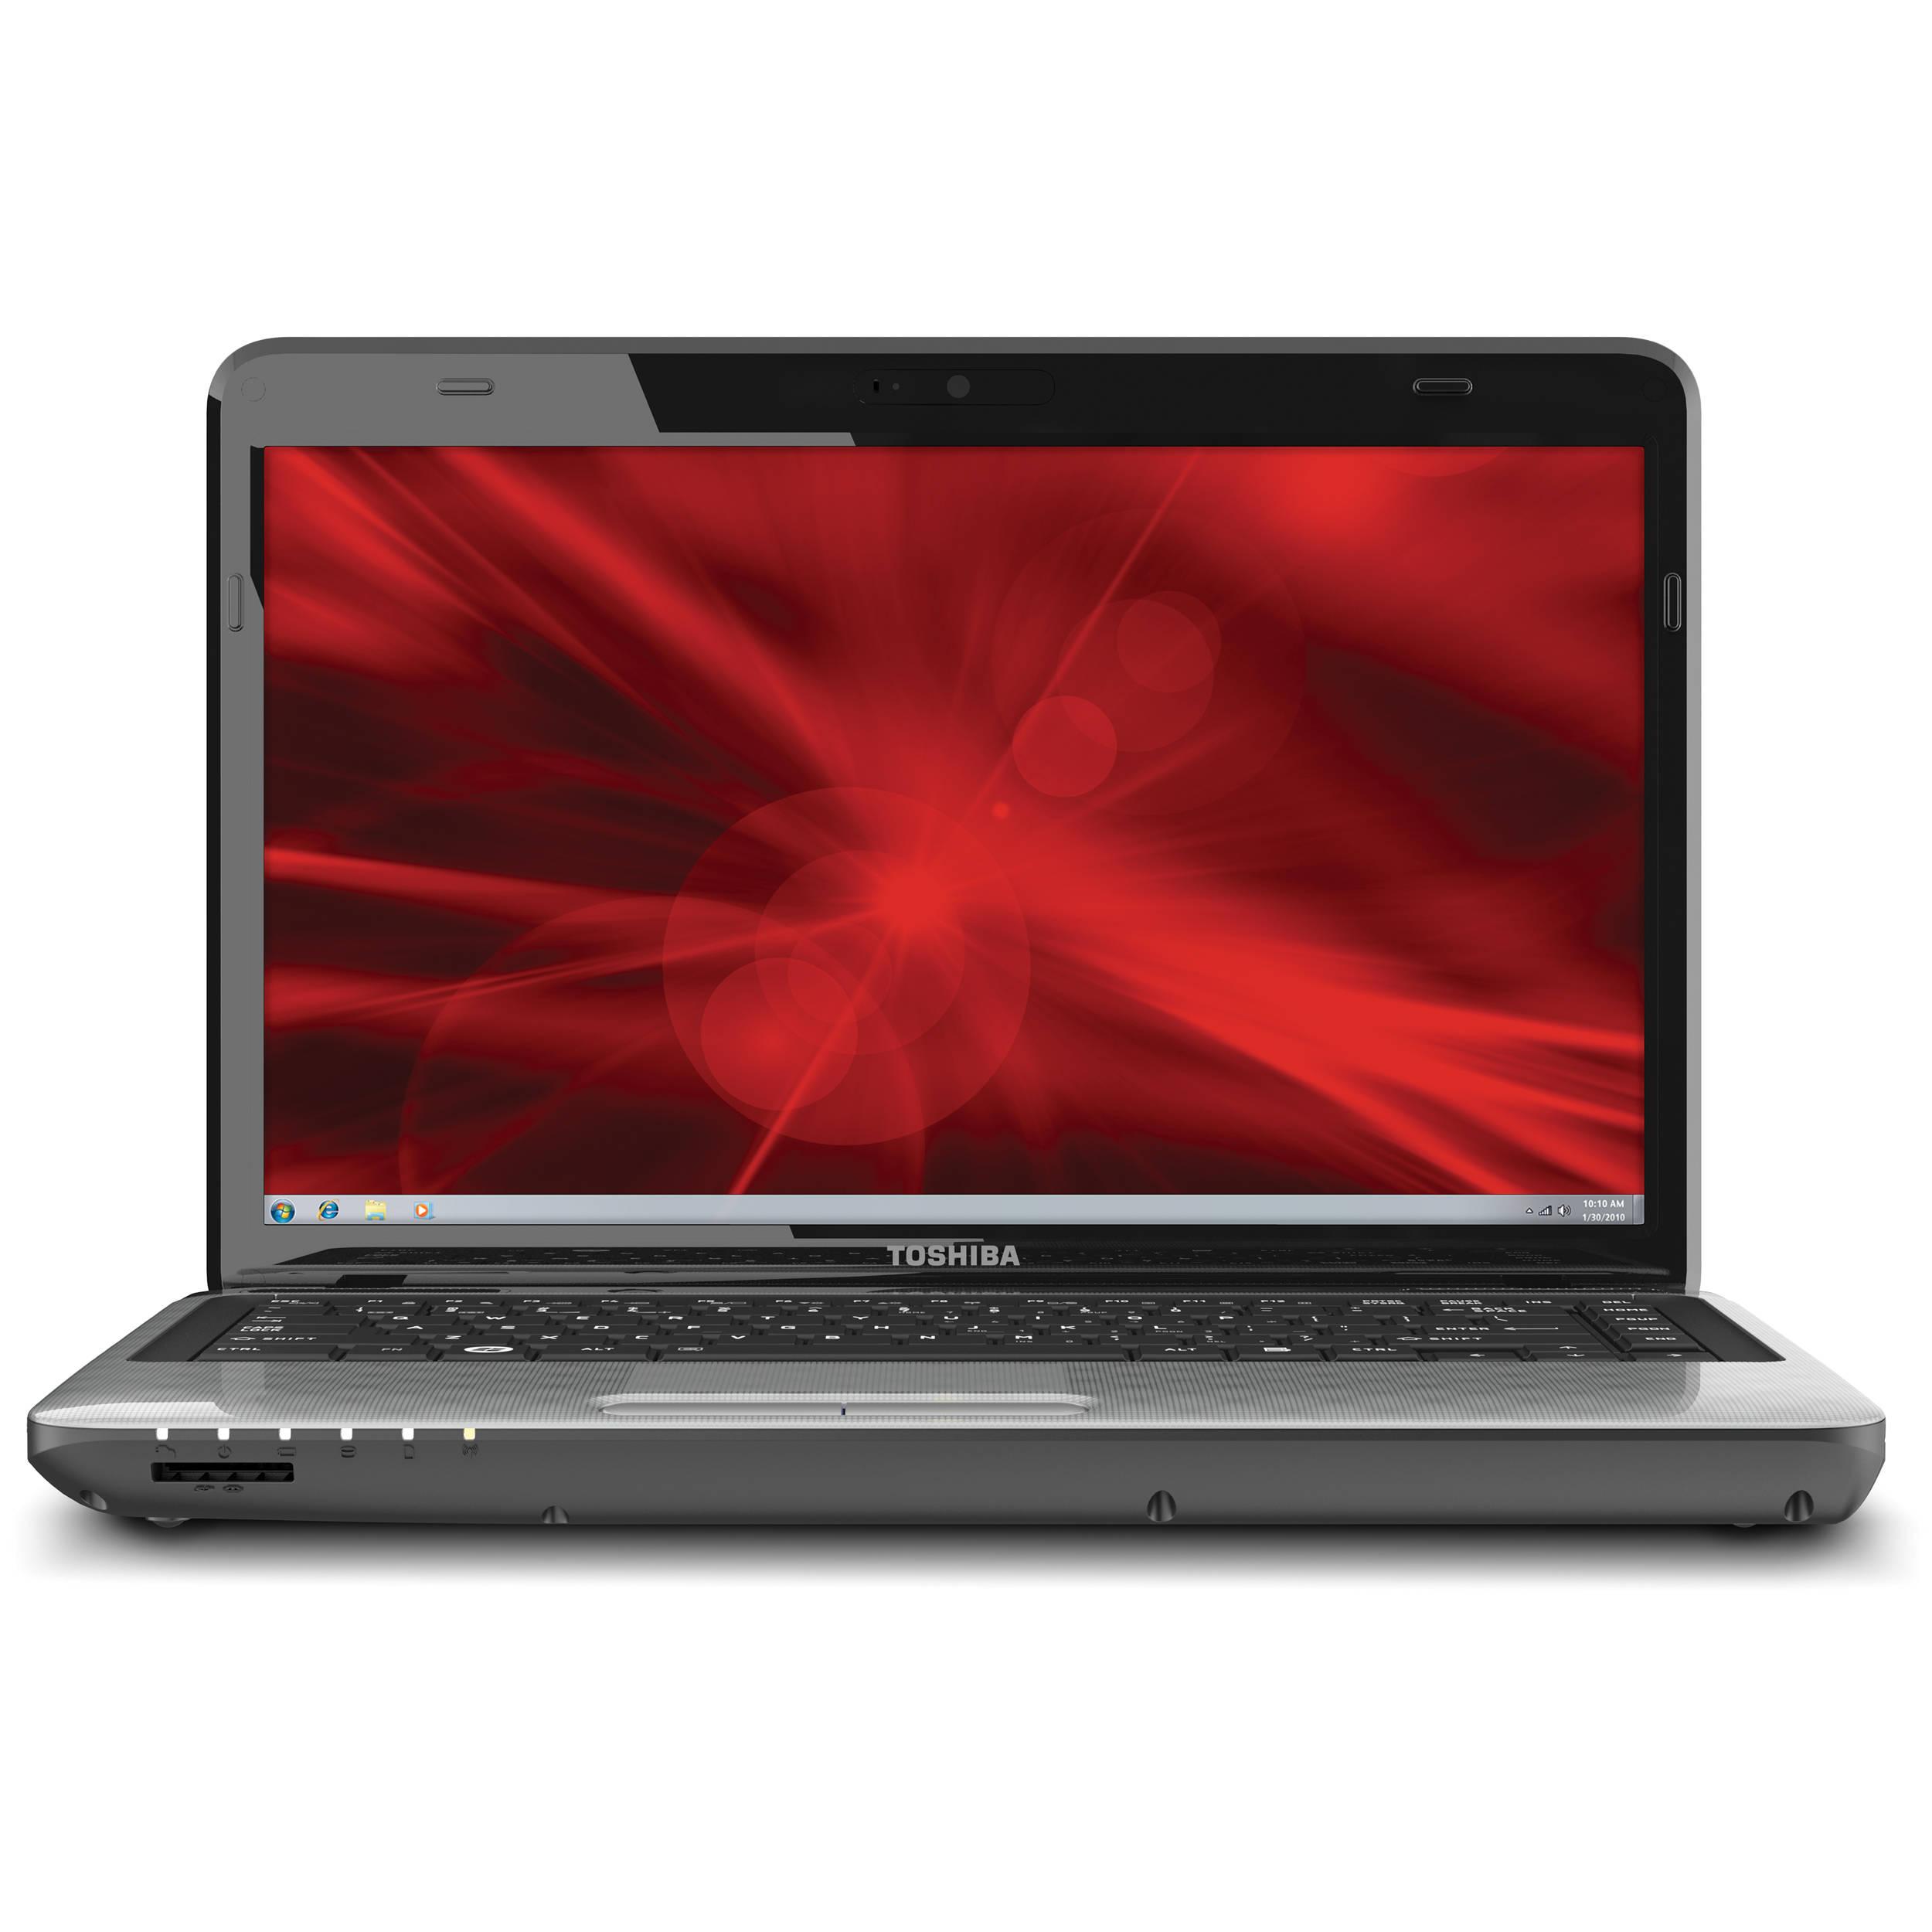 Toshiba Satellite L745 S4130 14 Notebook PSK0YU 0CX044 BampH